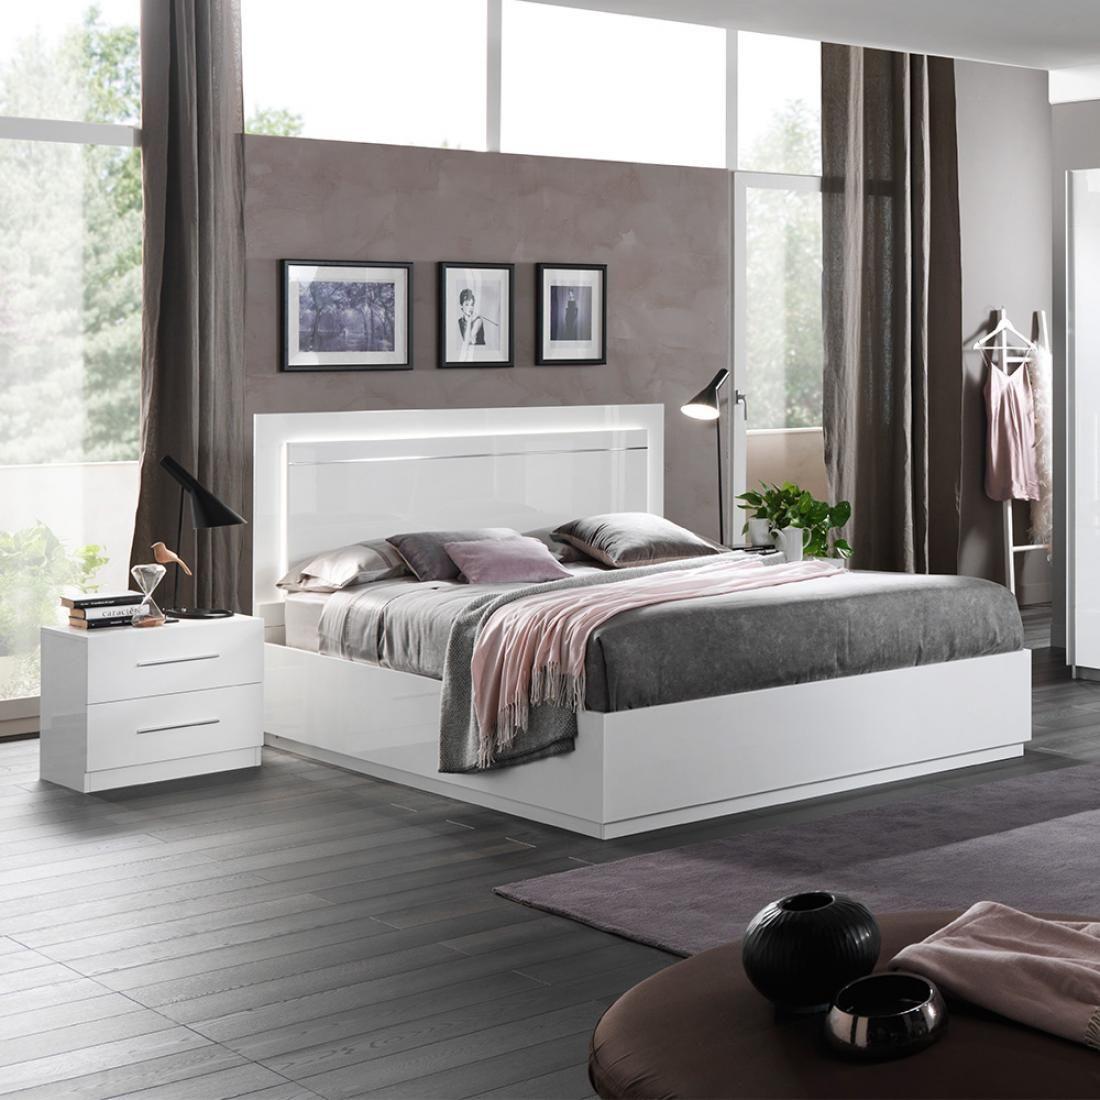 City/Star Modern Italian 6 Piece Bedroom Set White Gloss